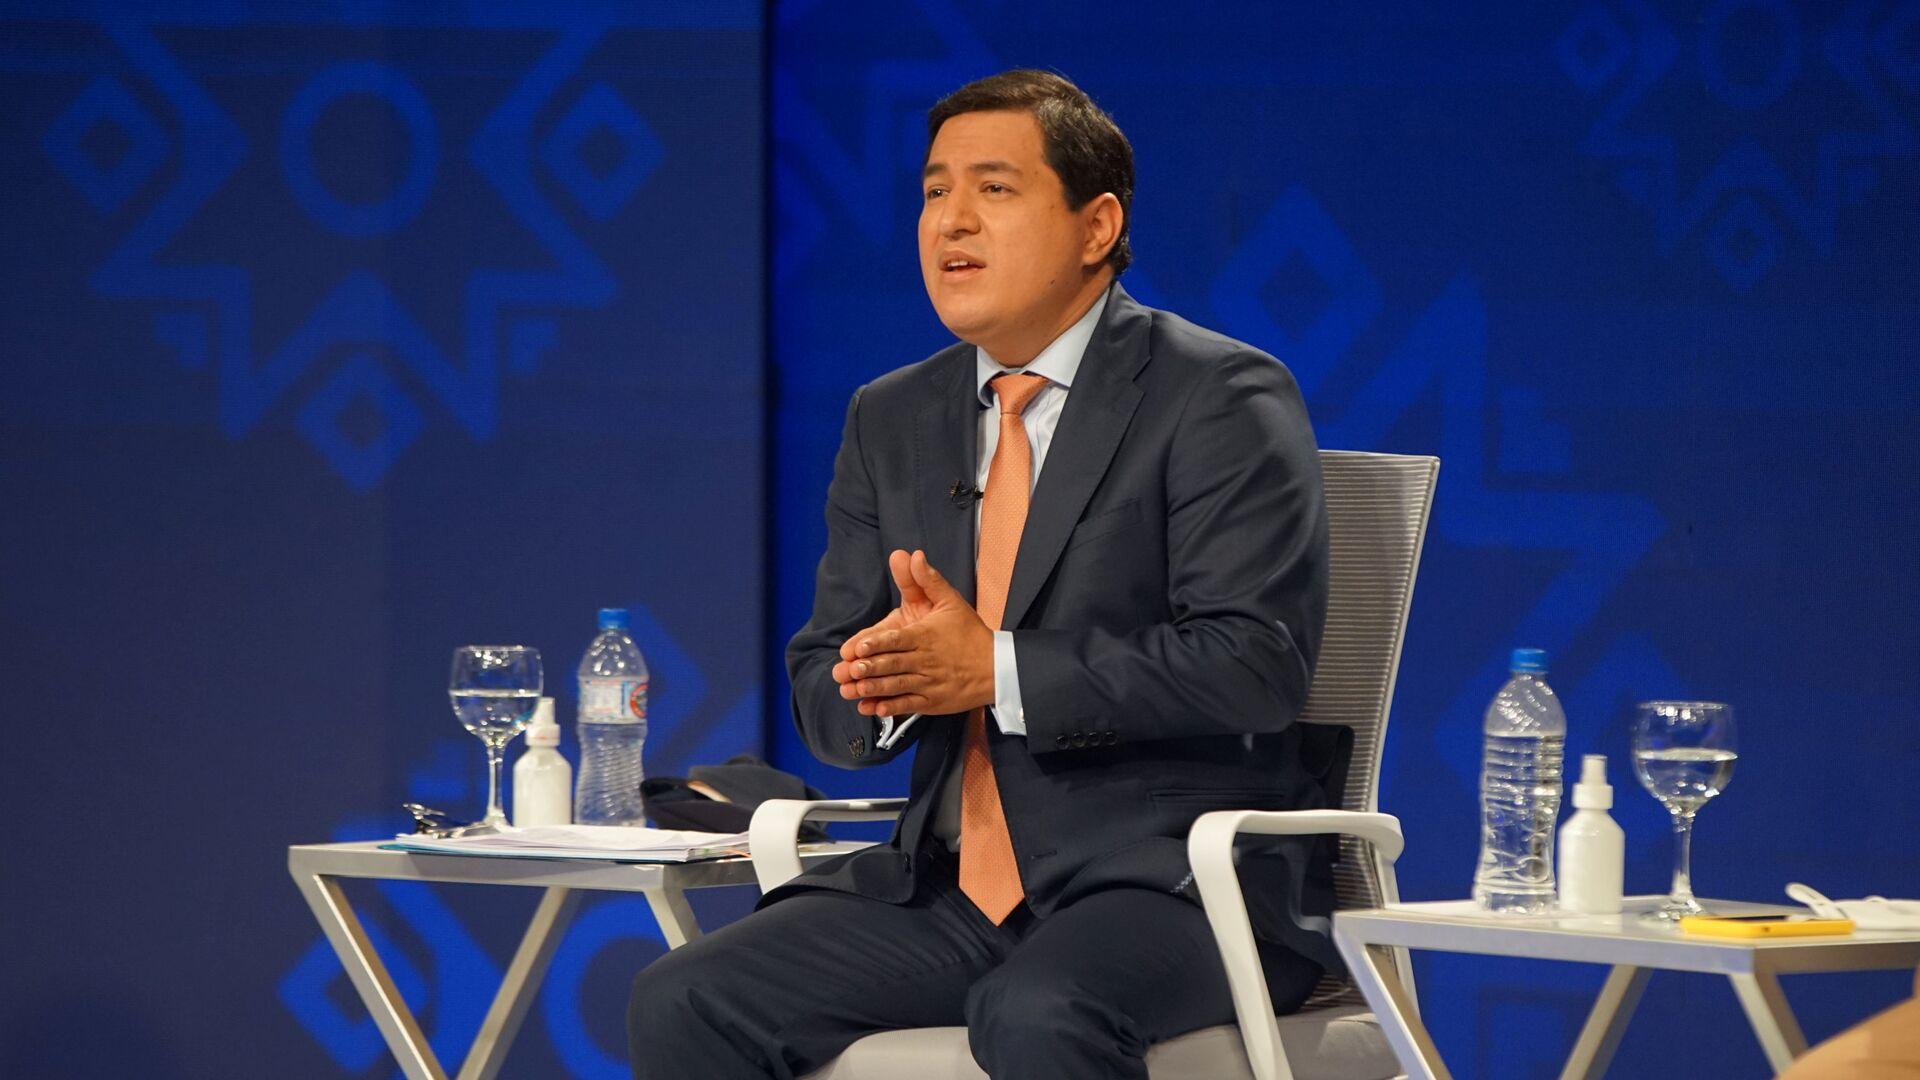 Andrés Arauz, el candidato a presidente de Ecuador - Sputnik Mundo, 1920, 12.02.2021